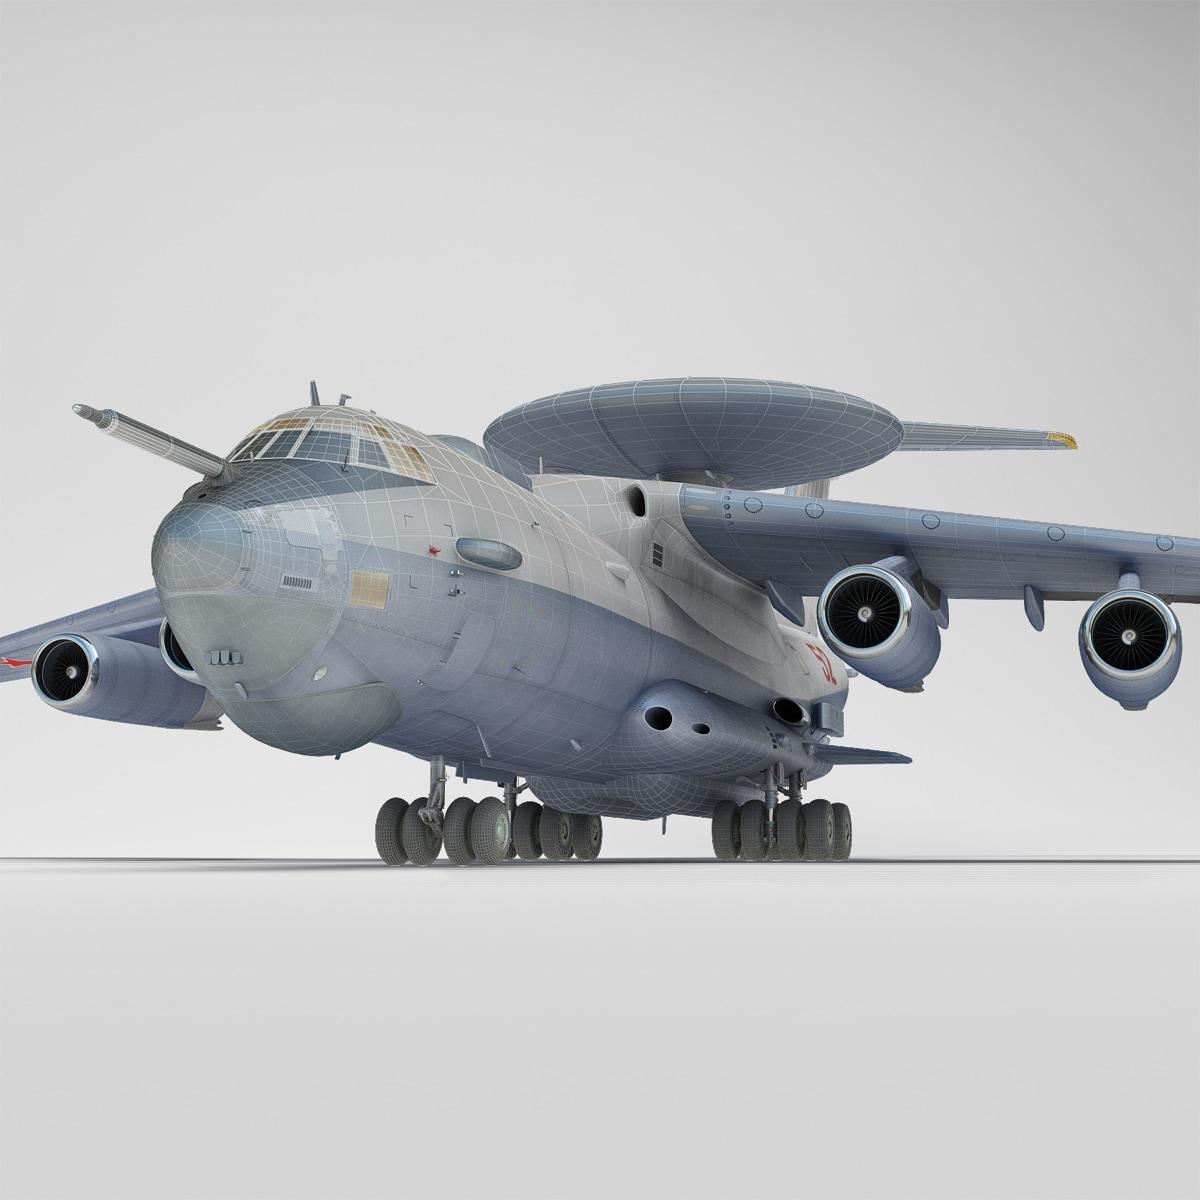 Ilyushin IL-76 Candid Rigged_6.jpg